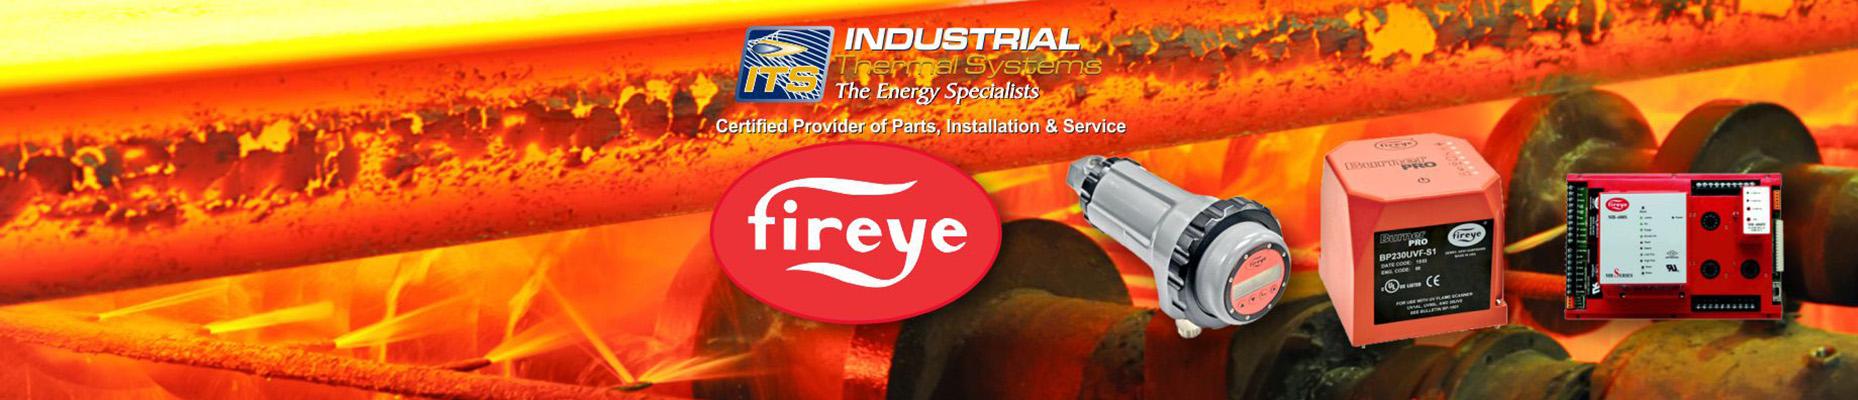 Fireye Burner Controls